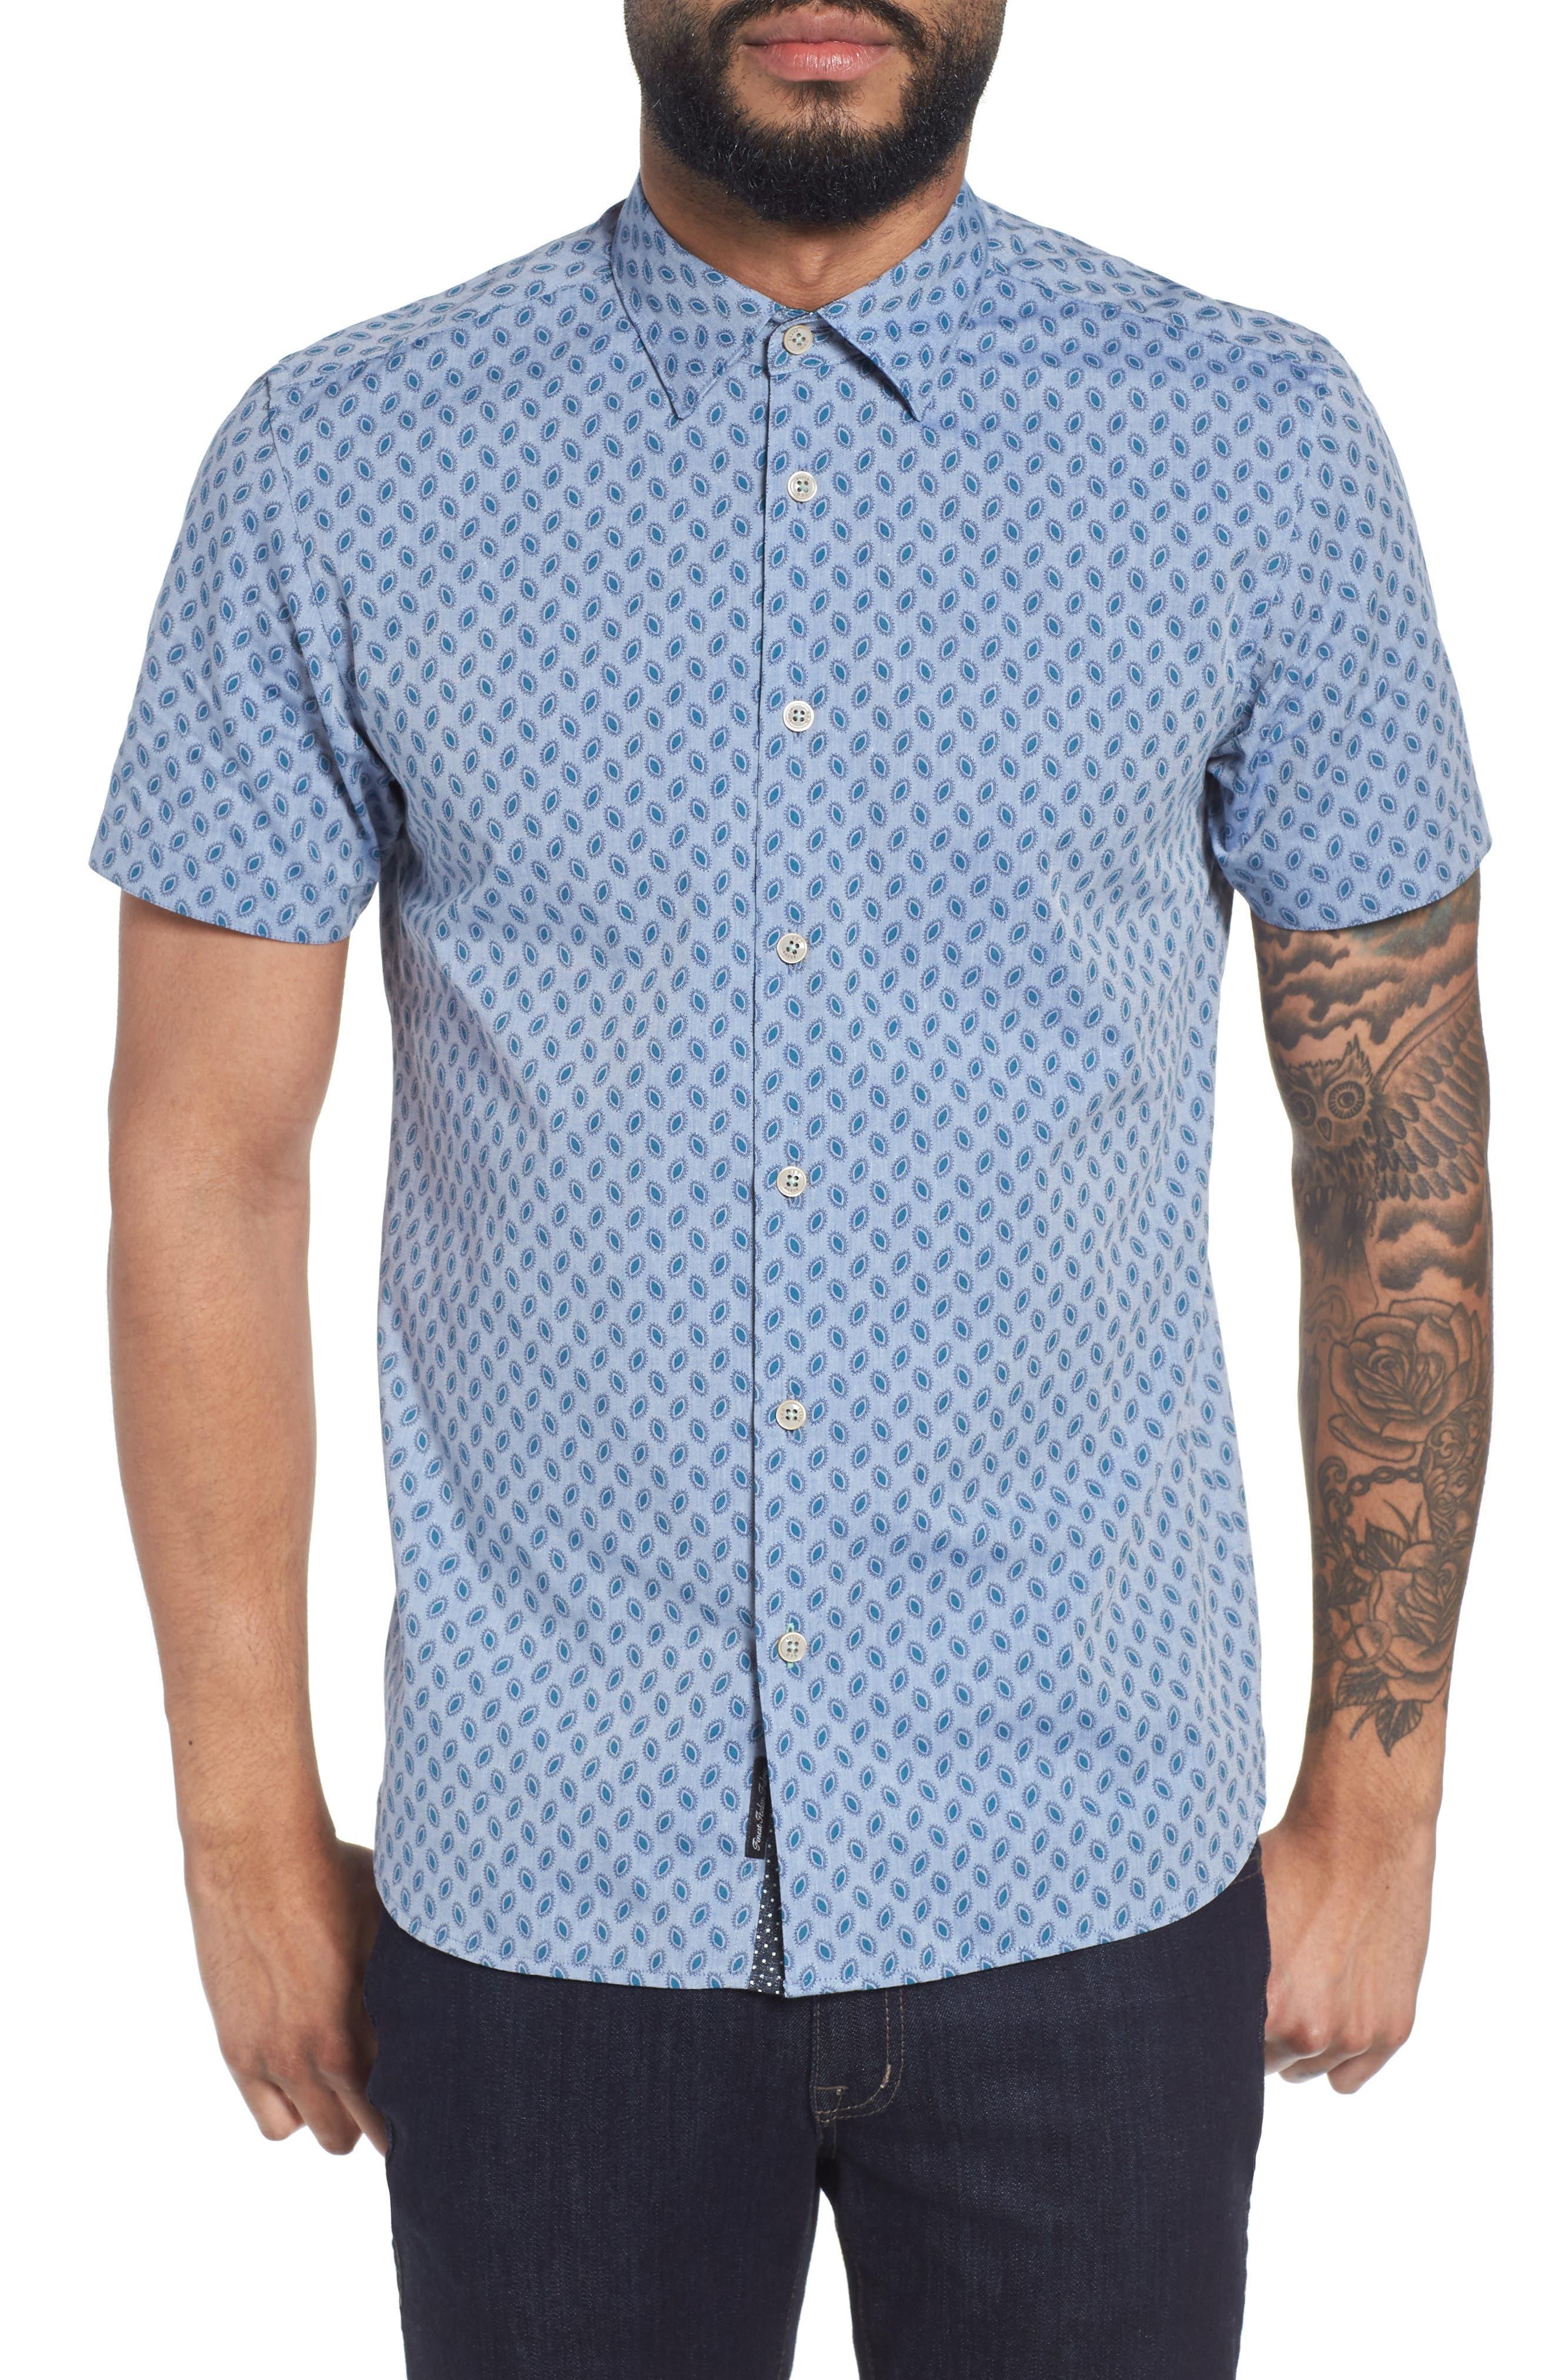 Newfott Extra Slim Fit Short Sleeve Sport Shirt,                         Main,                         color, Blue